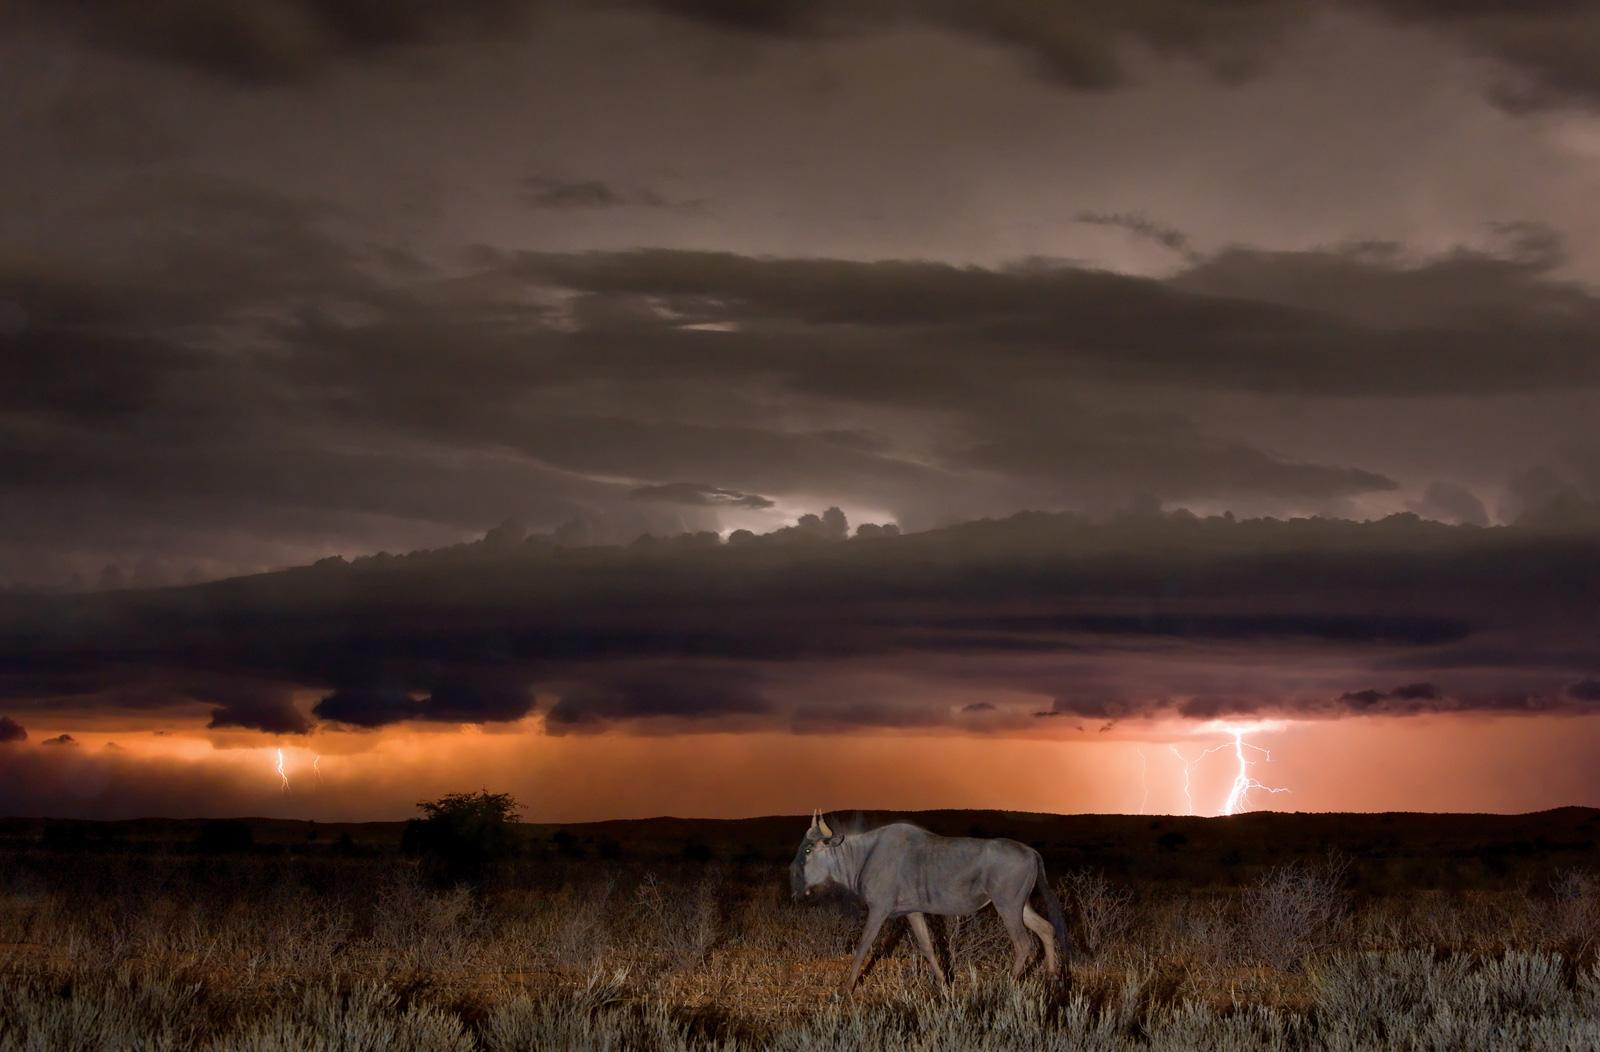 Hannes-Lochner-Kalahari-wildebeest-lightning